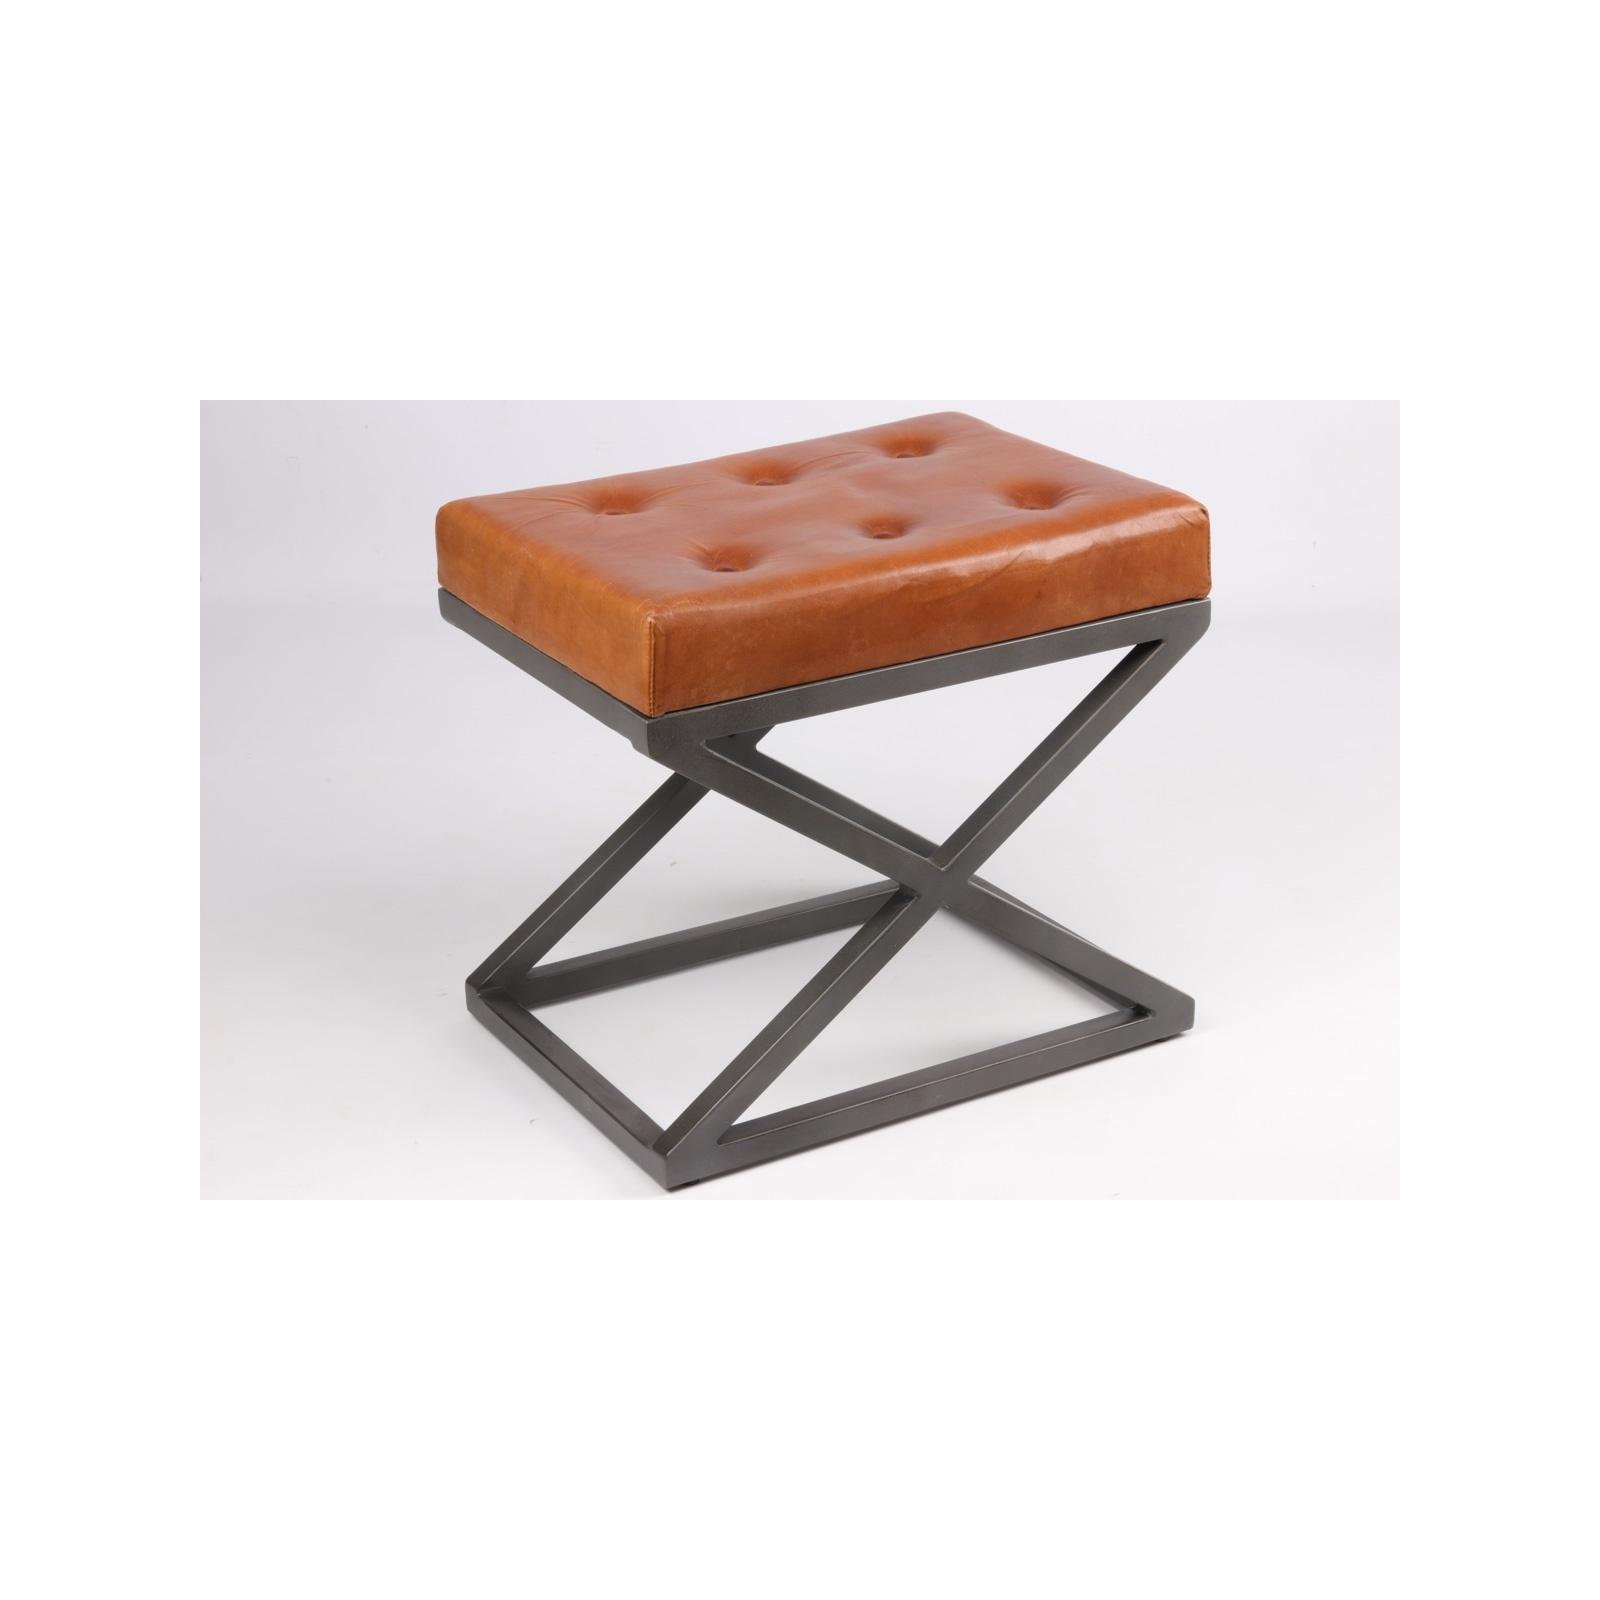 pouf industriel jp2b d coration. Black Bedroom Furniture Sets. Home Design Ideas